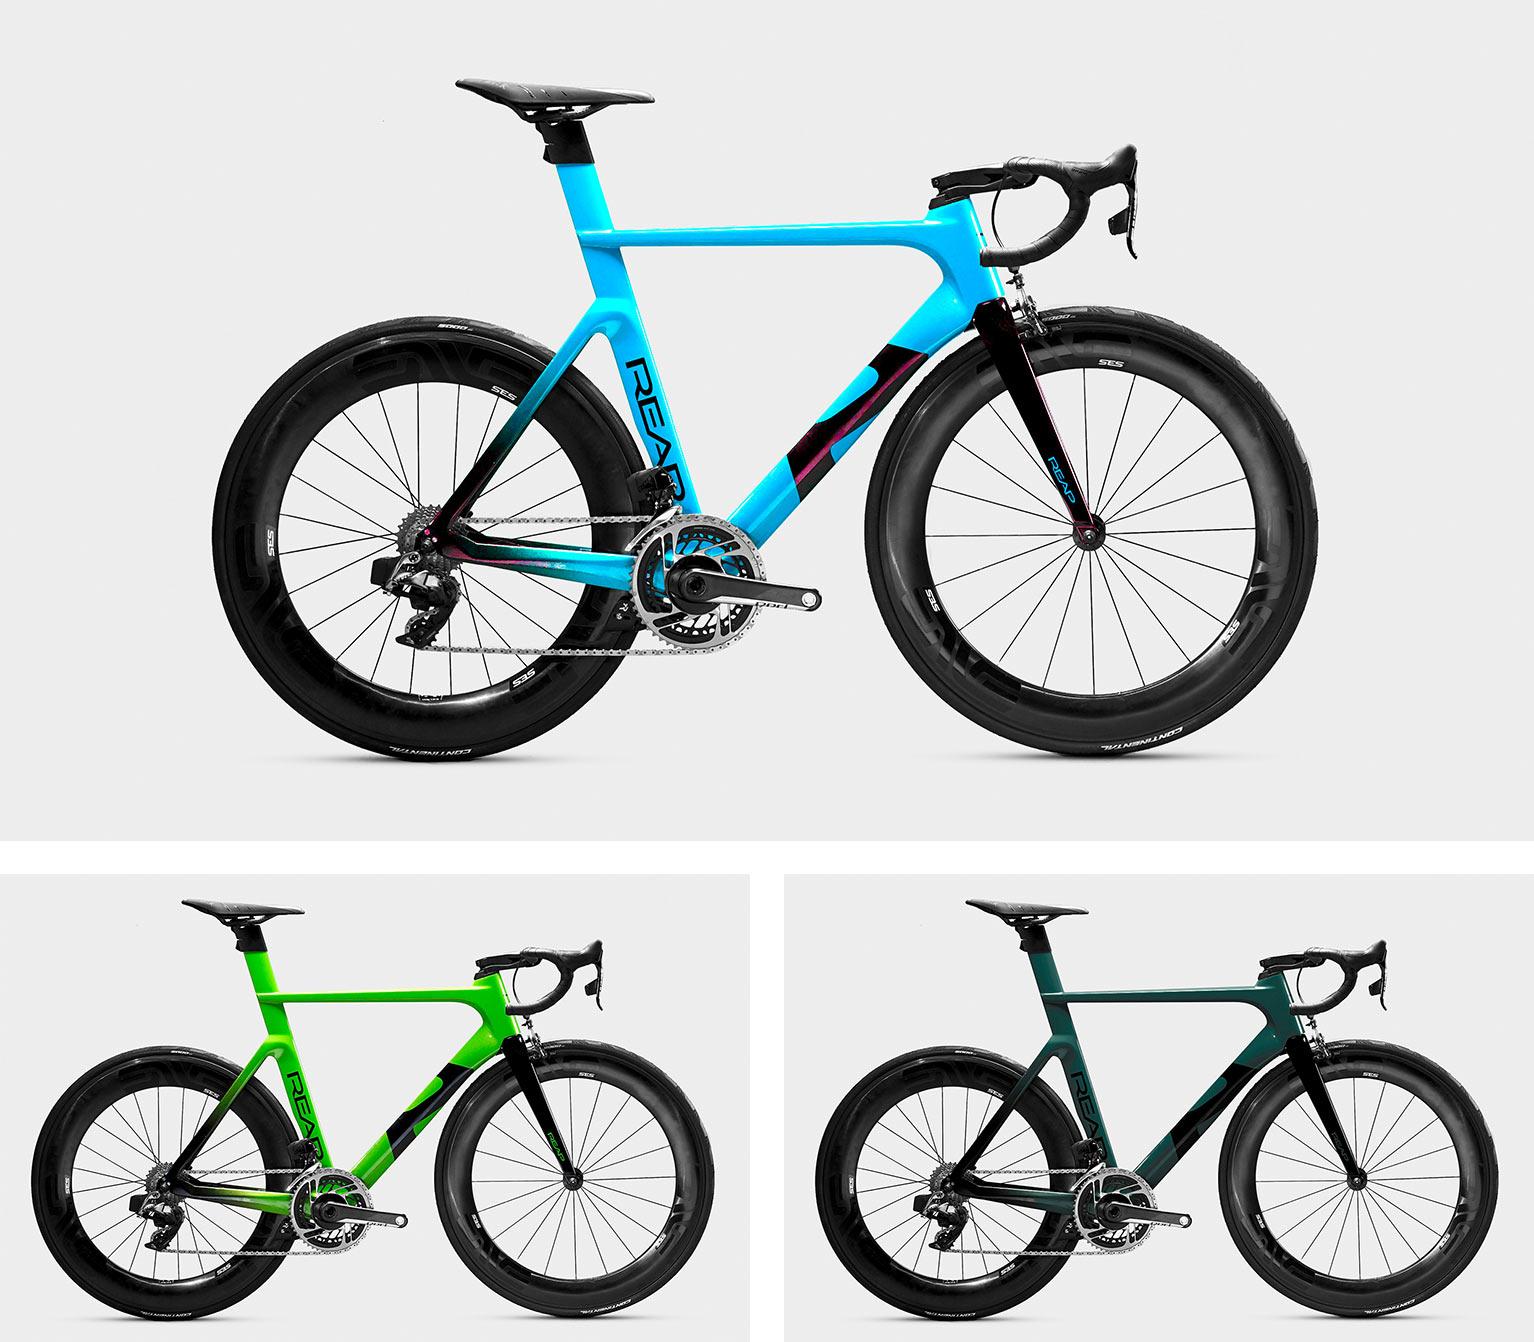 reap vekta aero road bike frame colors and complete bikes